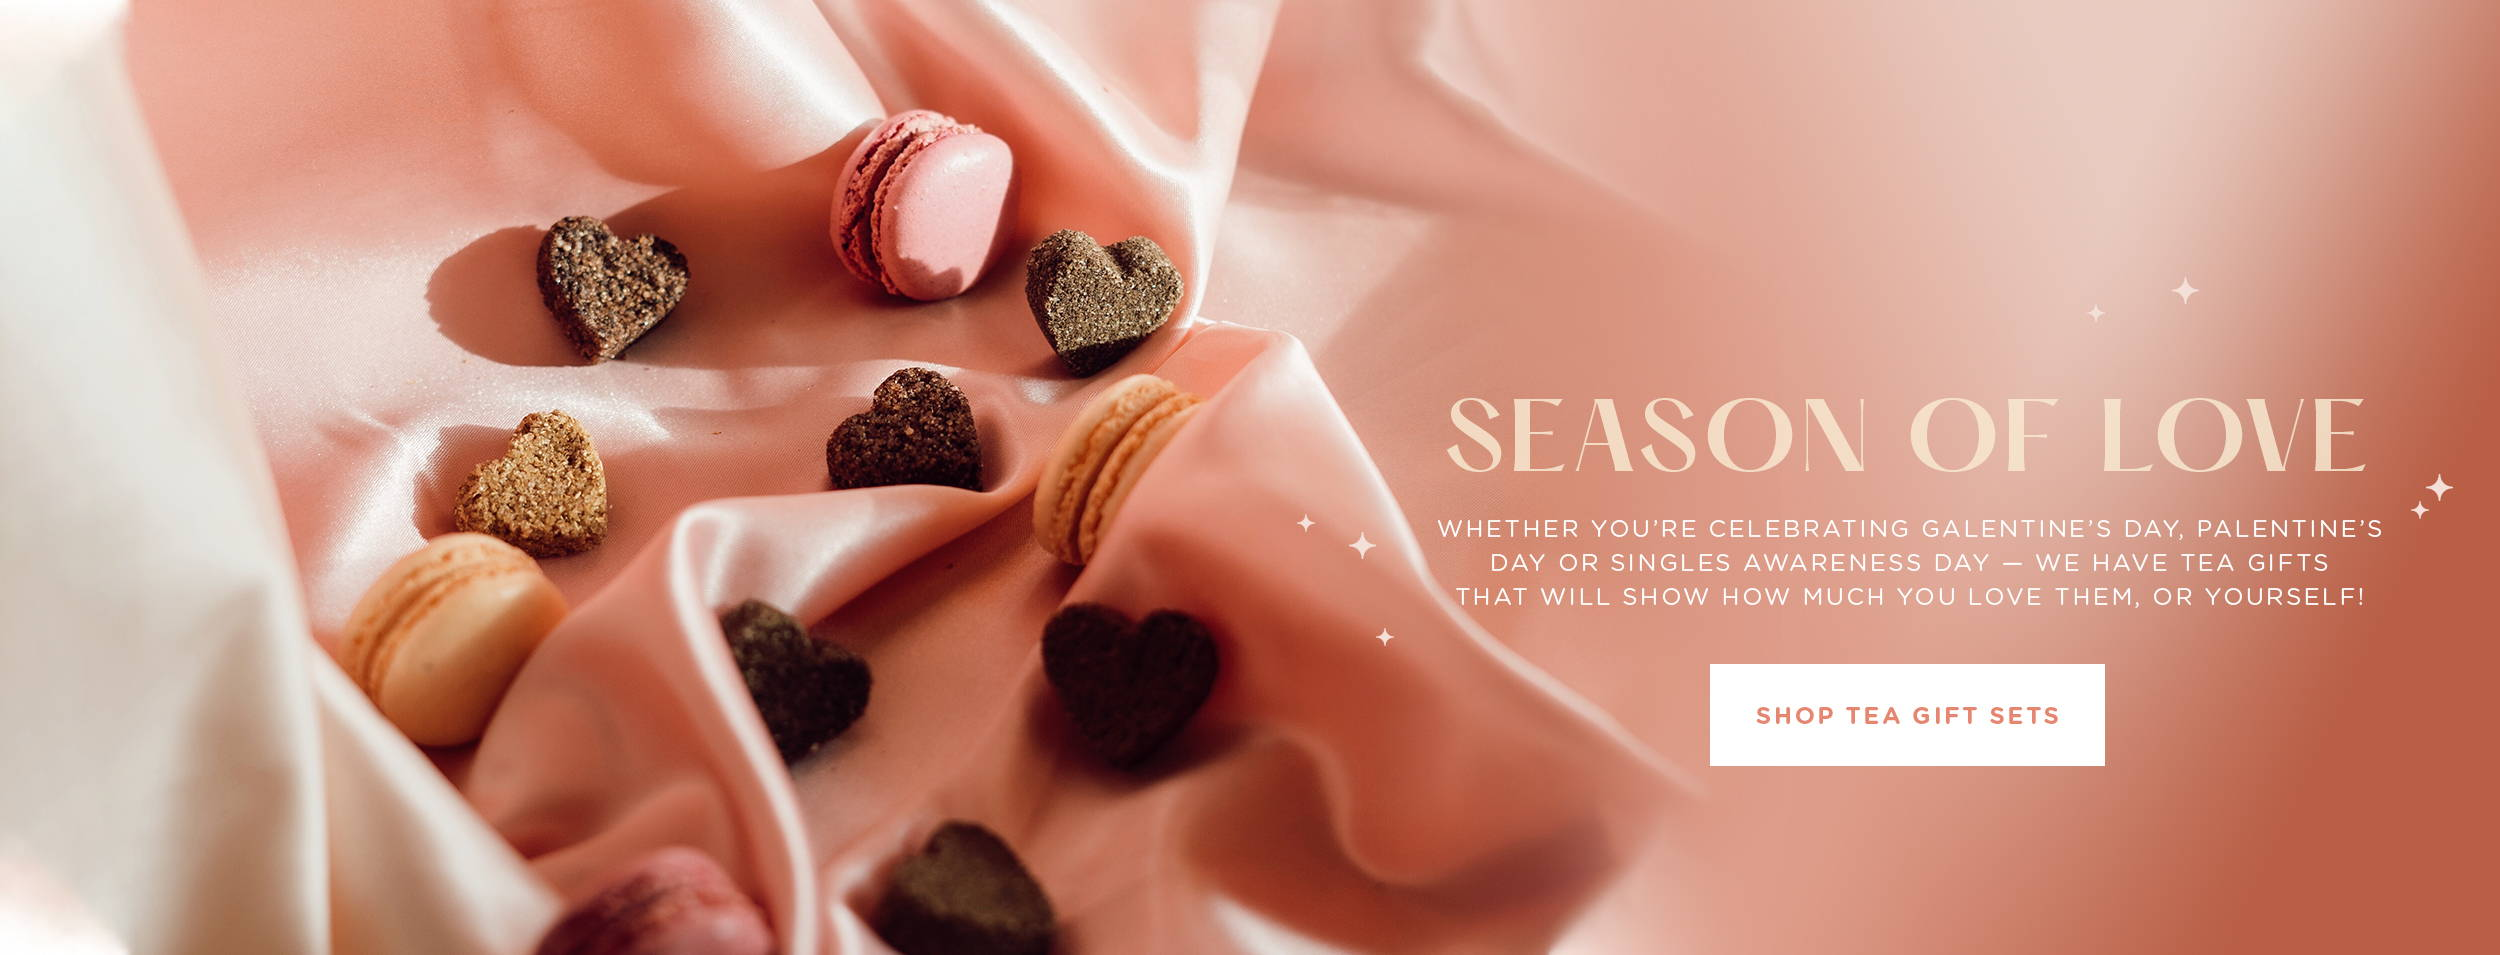 Shop Tea Gift Sets this Season of Love